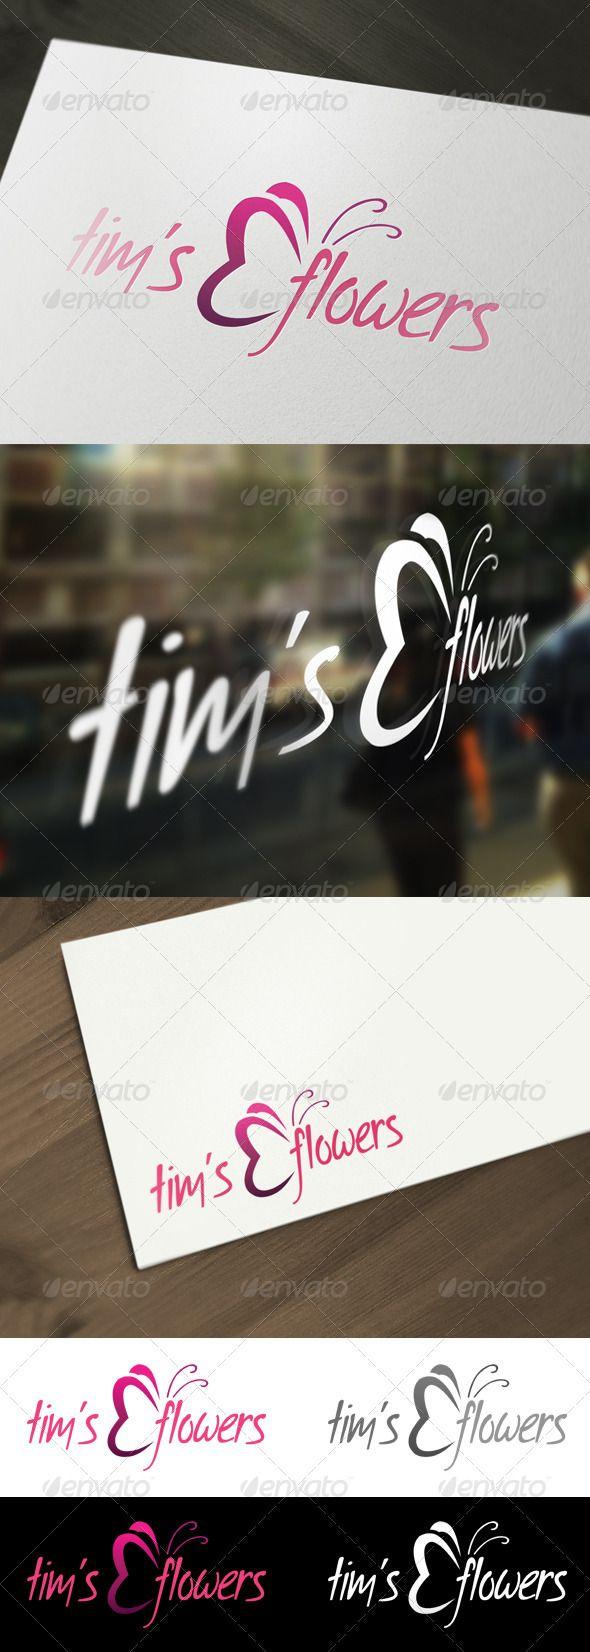 Flower  Florist Logo Template — Photoshop PSD #purple #PSD logo • Available here → https://graphicriver.net/item/flower-florist-logo-template/2072069?ref=pxcr